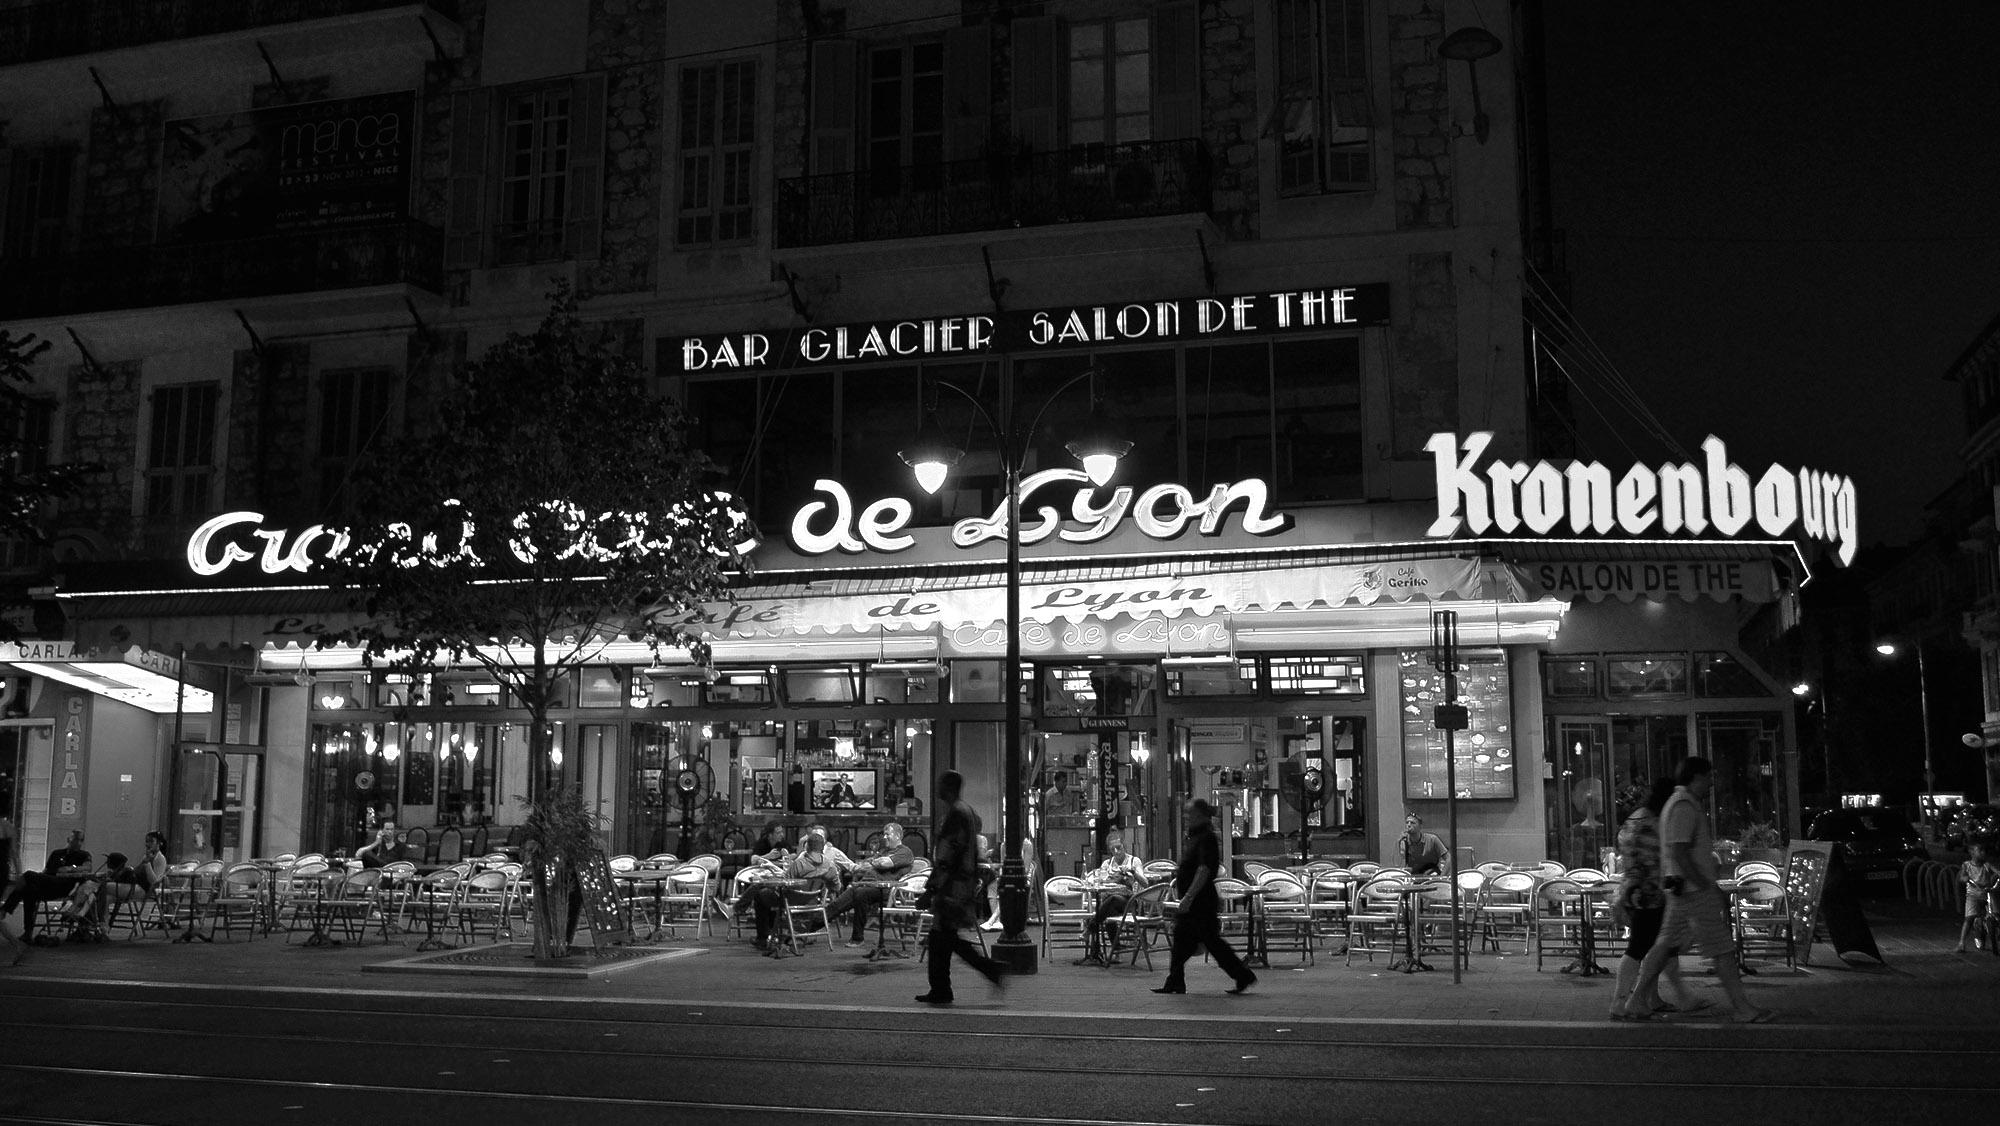 Grand Cafe de Lyon, Nice, France